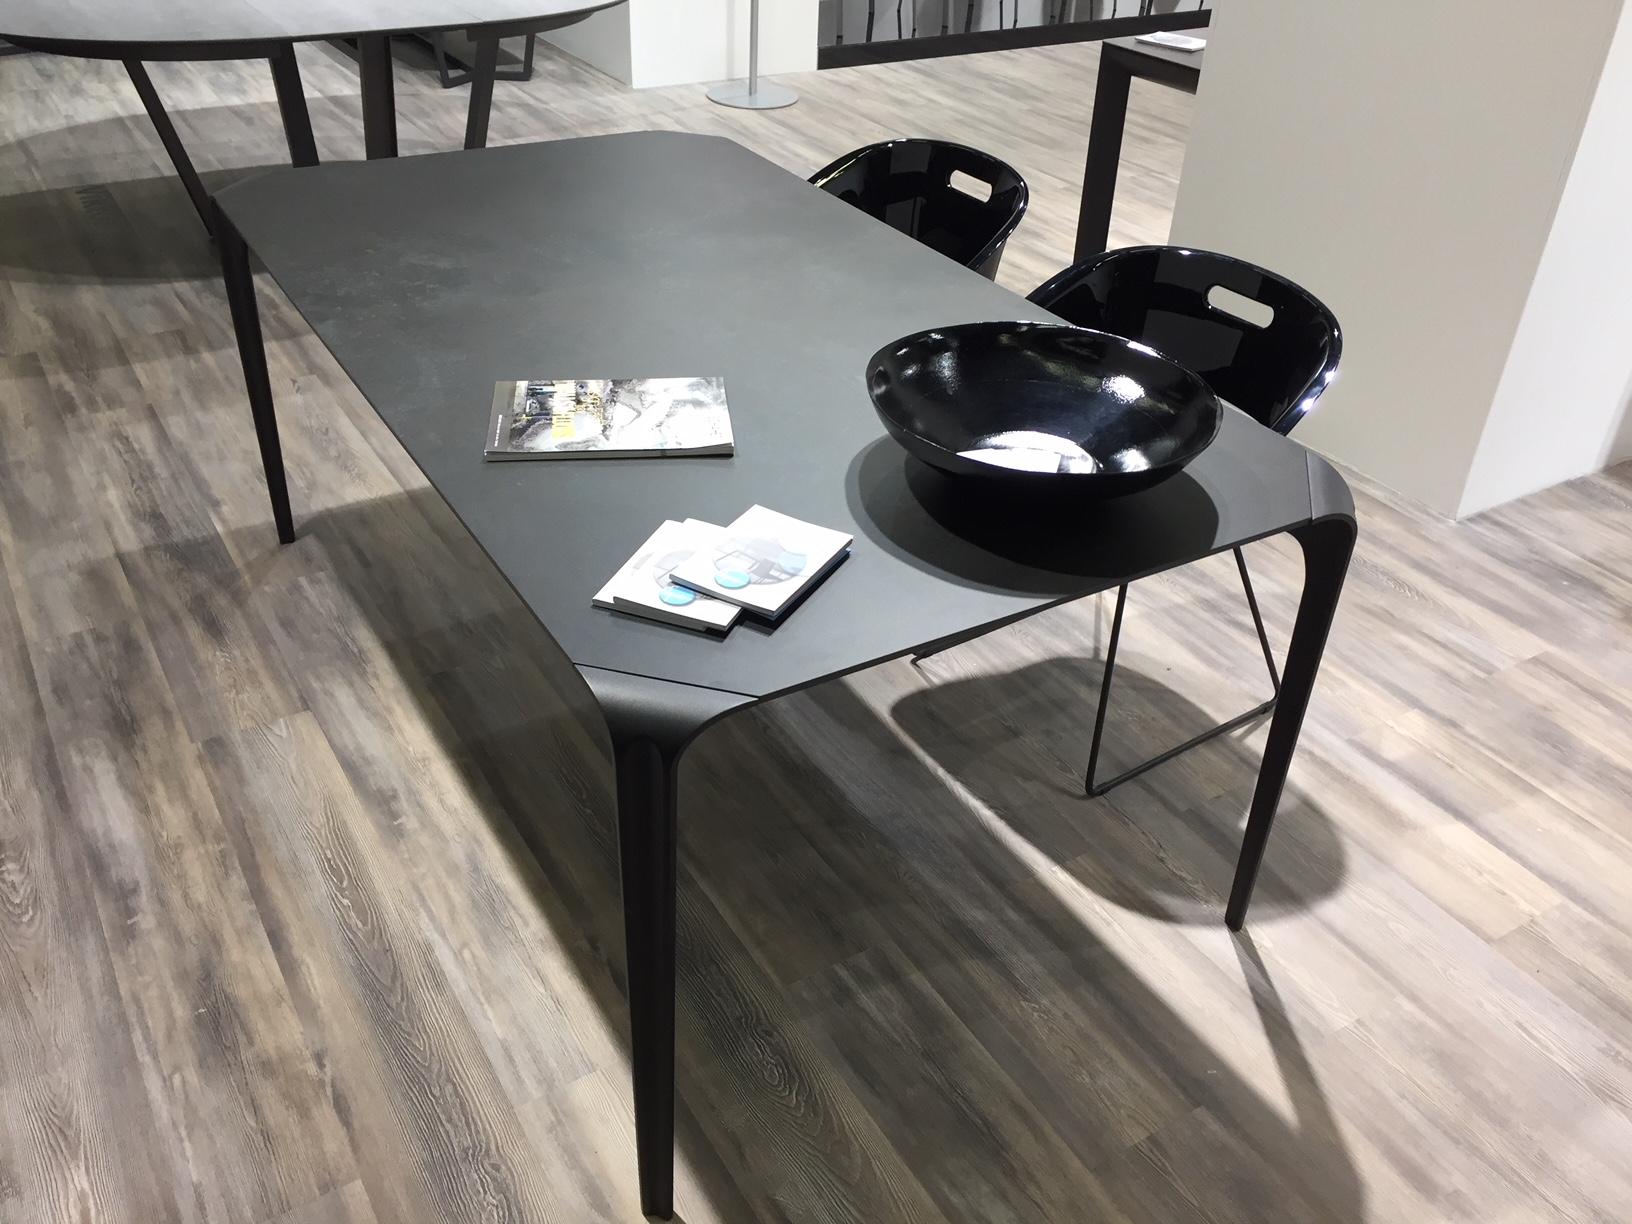 Table de repas salle manger meubles steinmetz - Meubles steinmetz ...